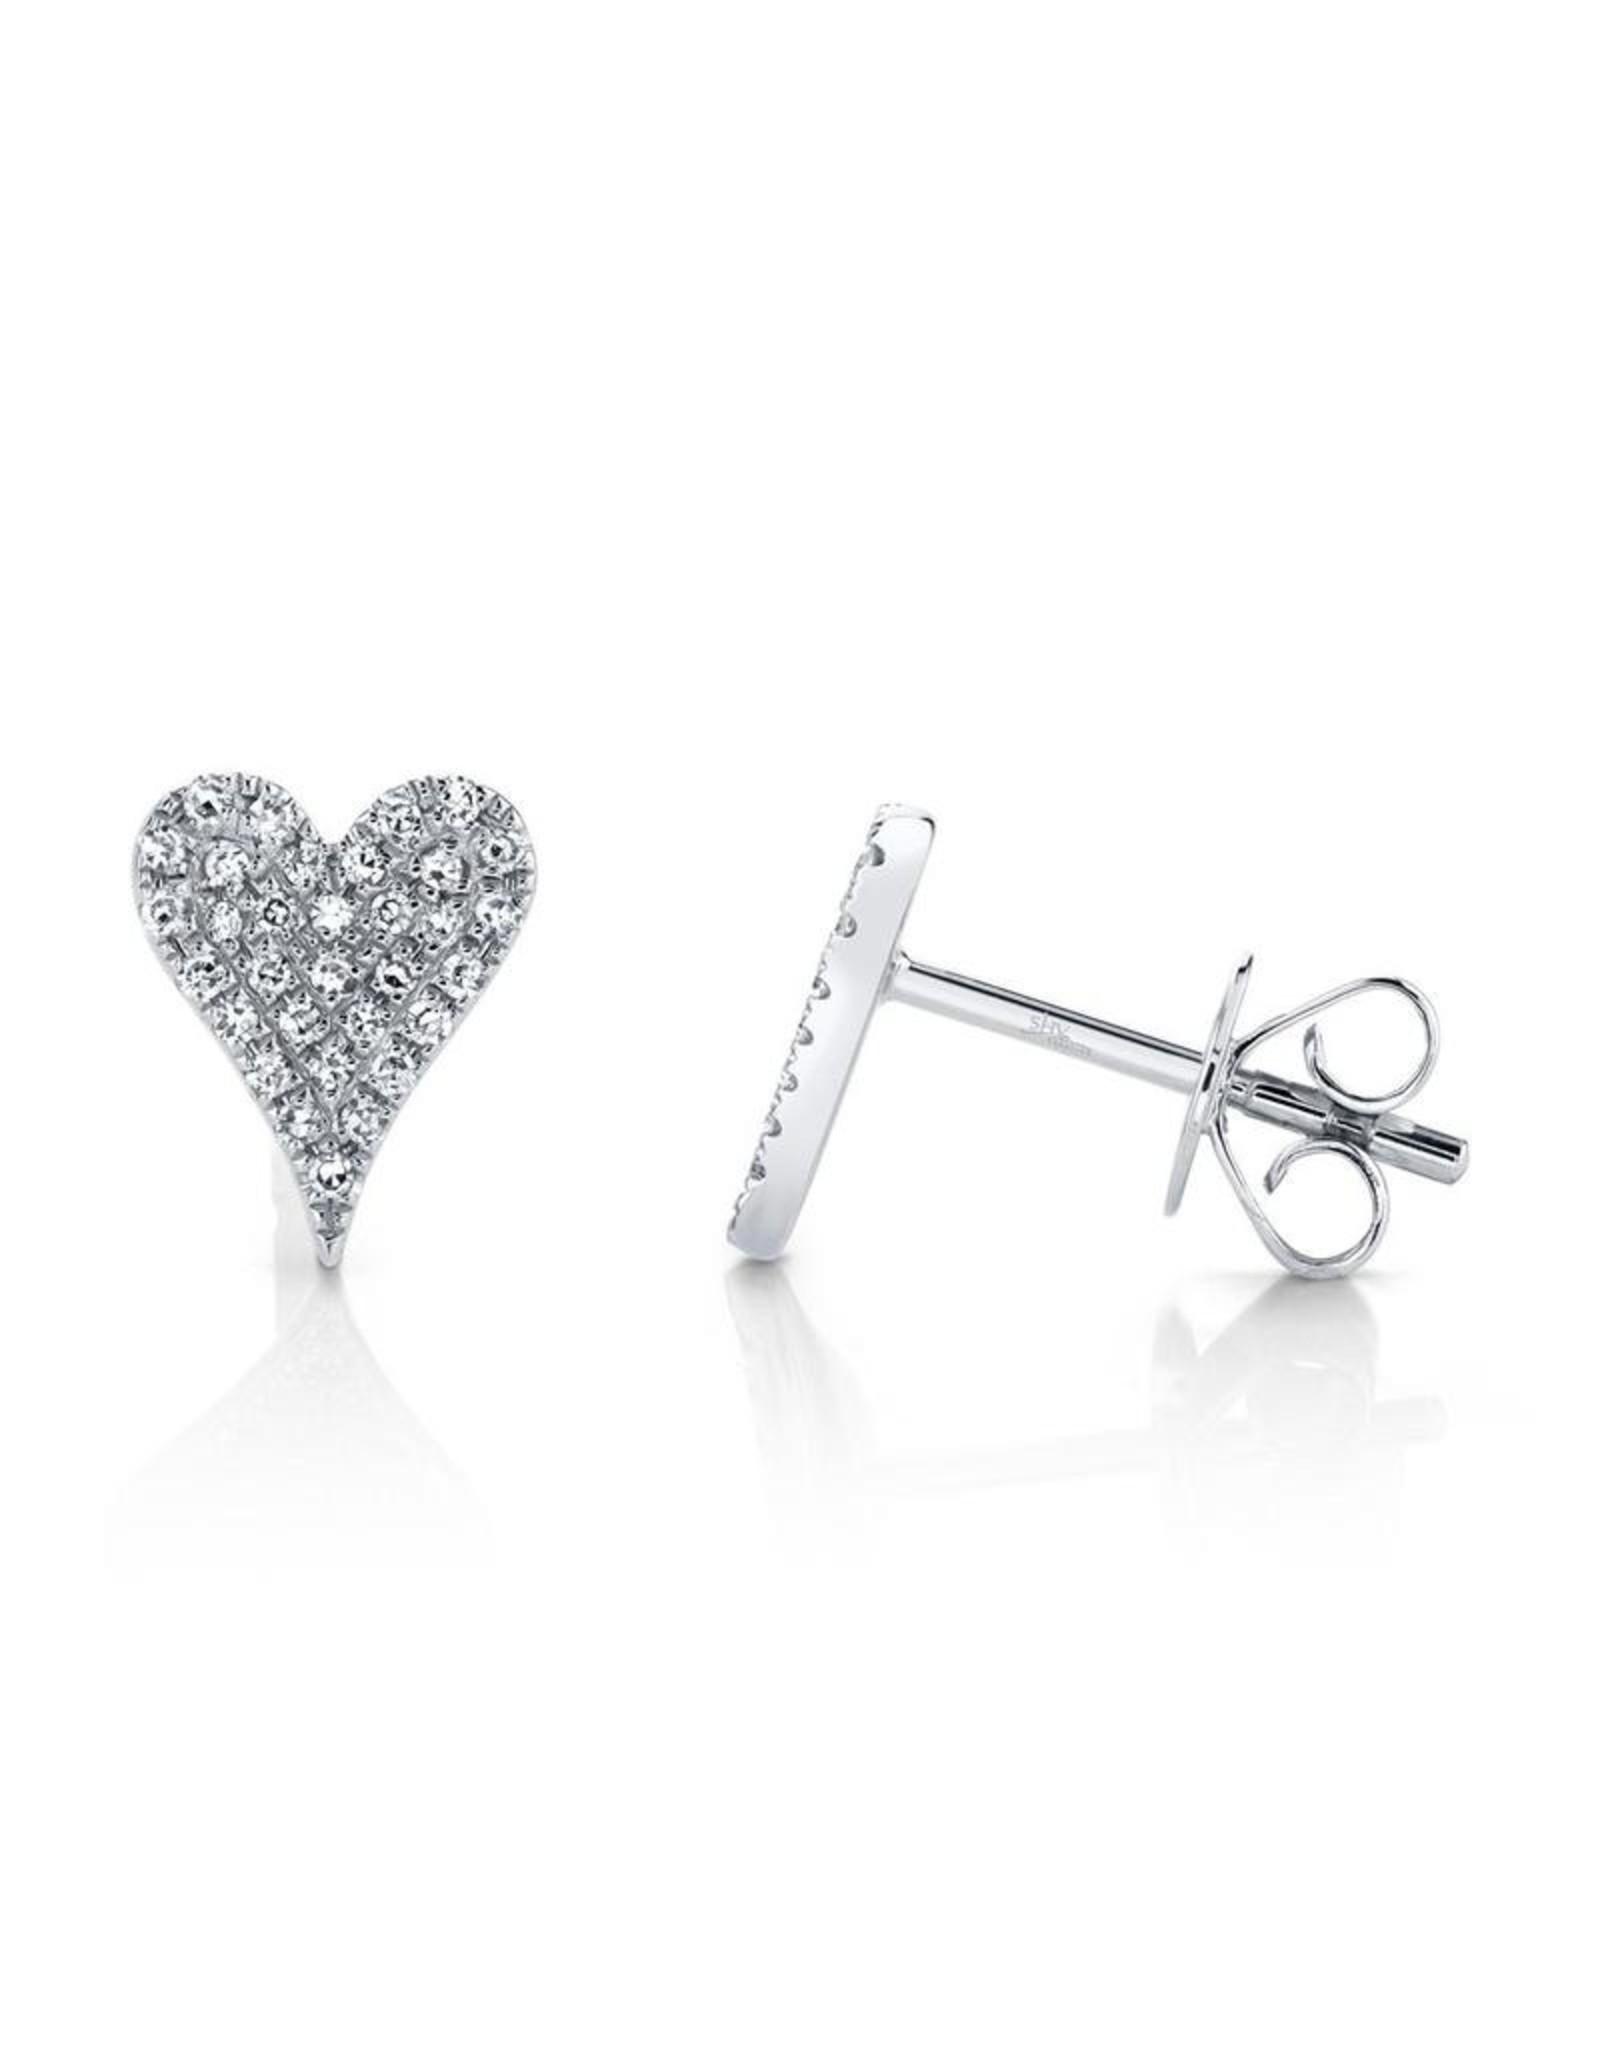 14K W/G Small Pave Diamond Heart Stud Earrings, D: 0.14ct